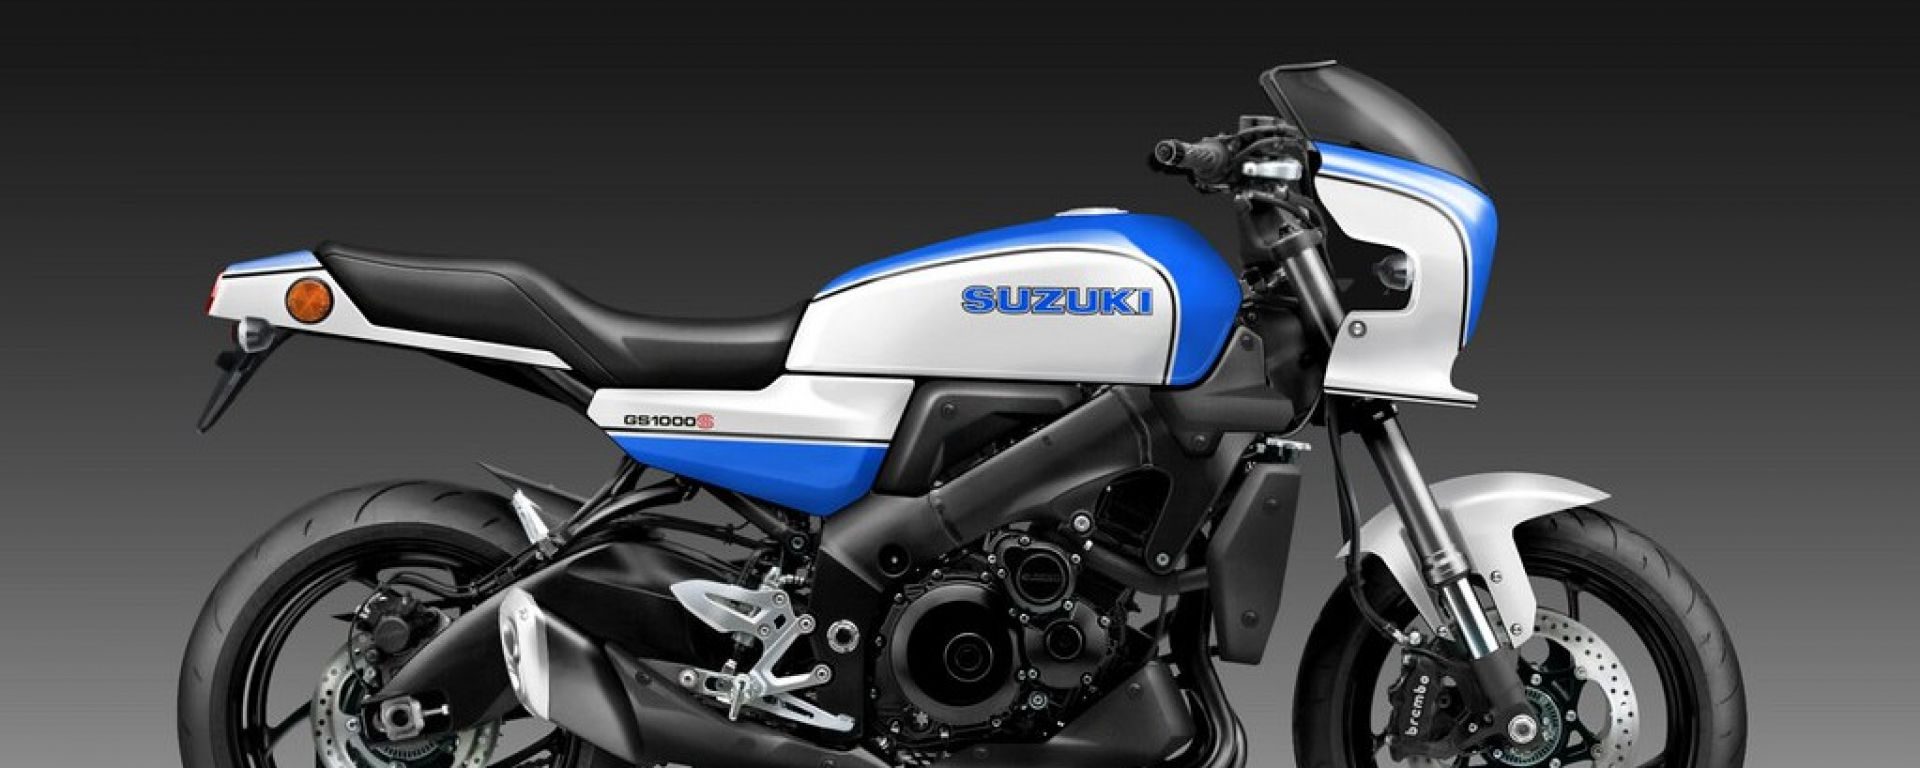 Suzuki GS 1000 S Concept di Oberdan Bezzi